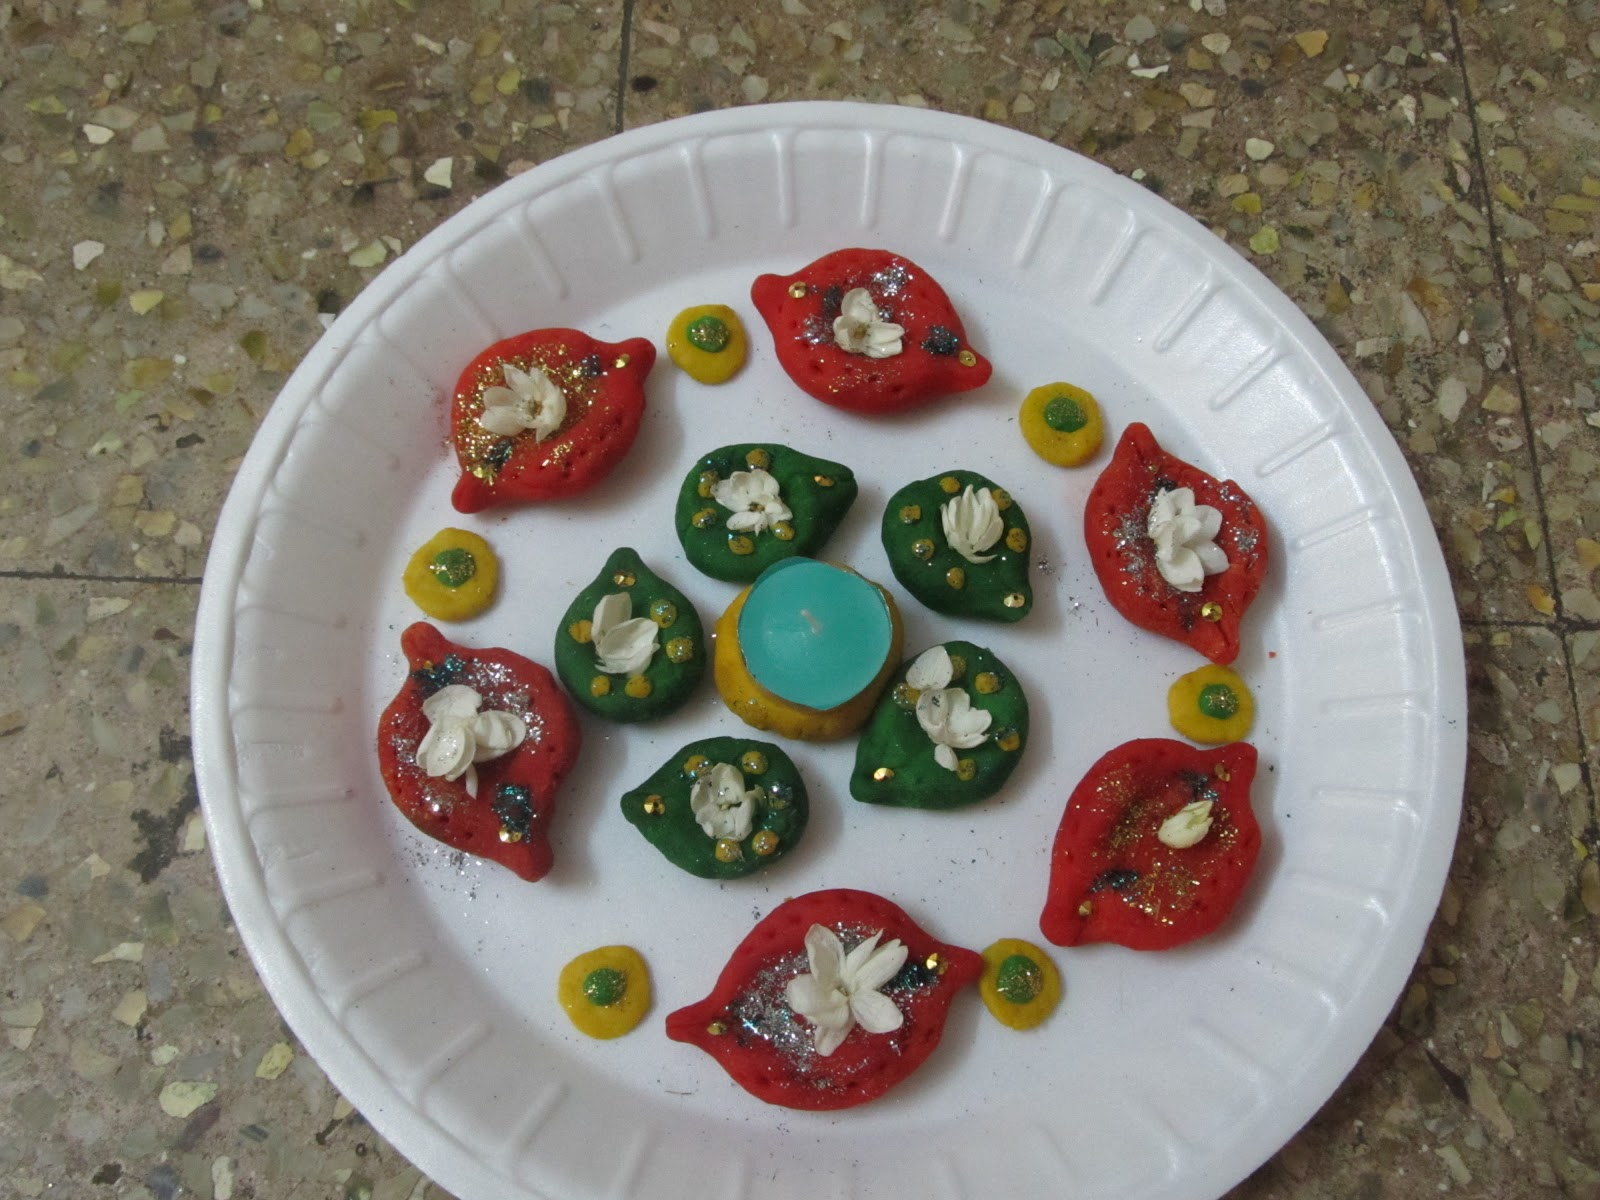 creative ideas: Aarthi plates